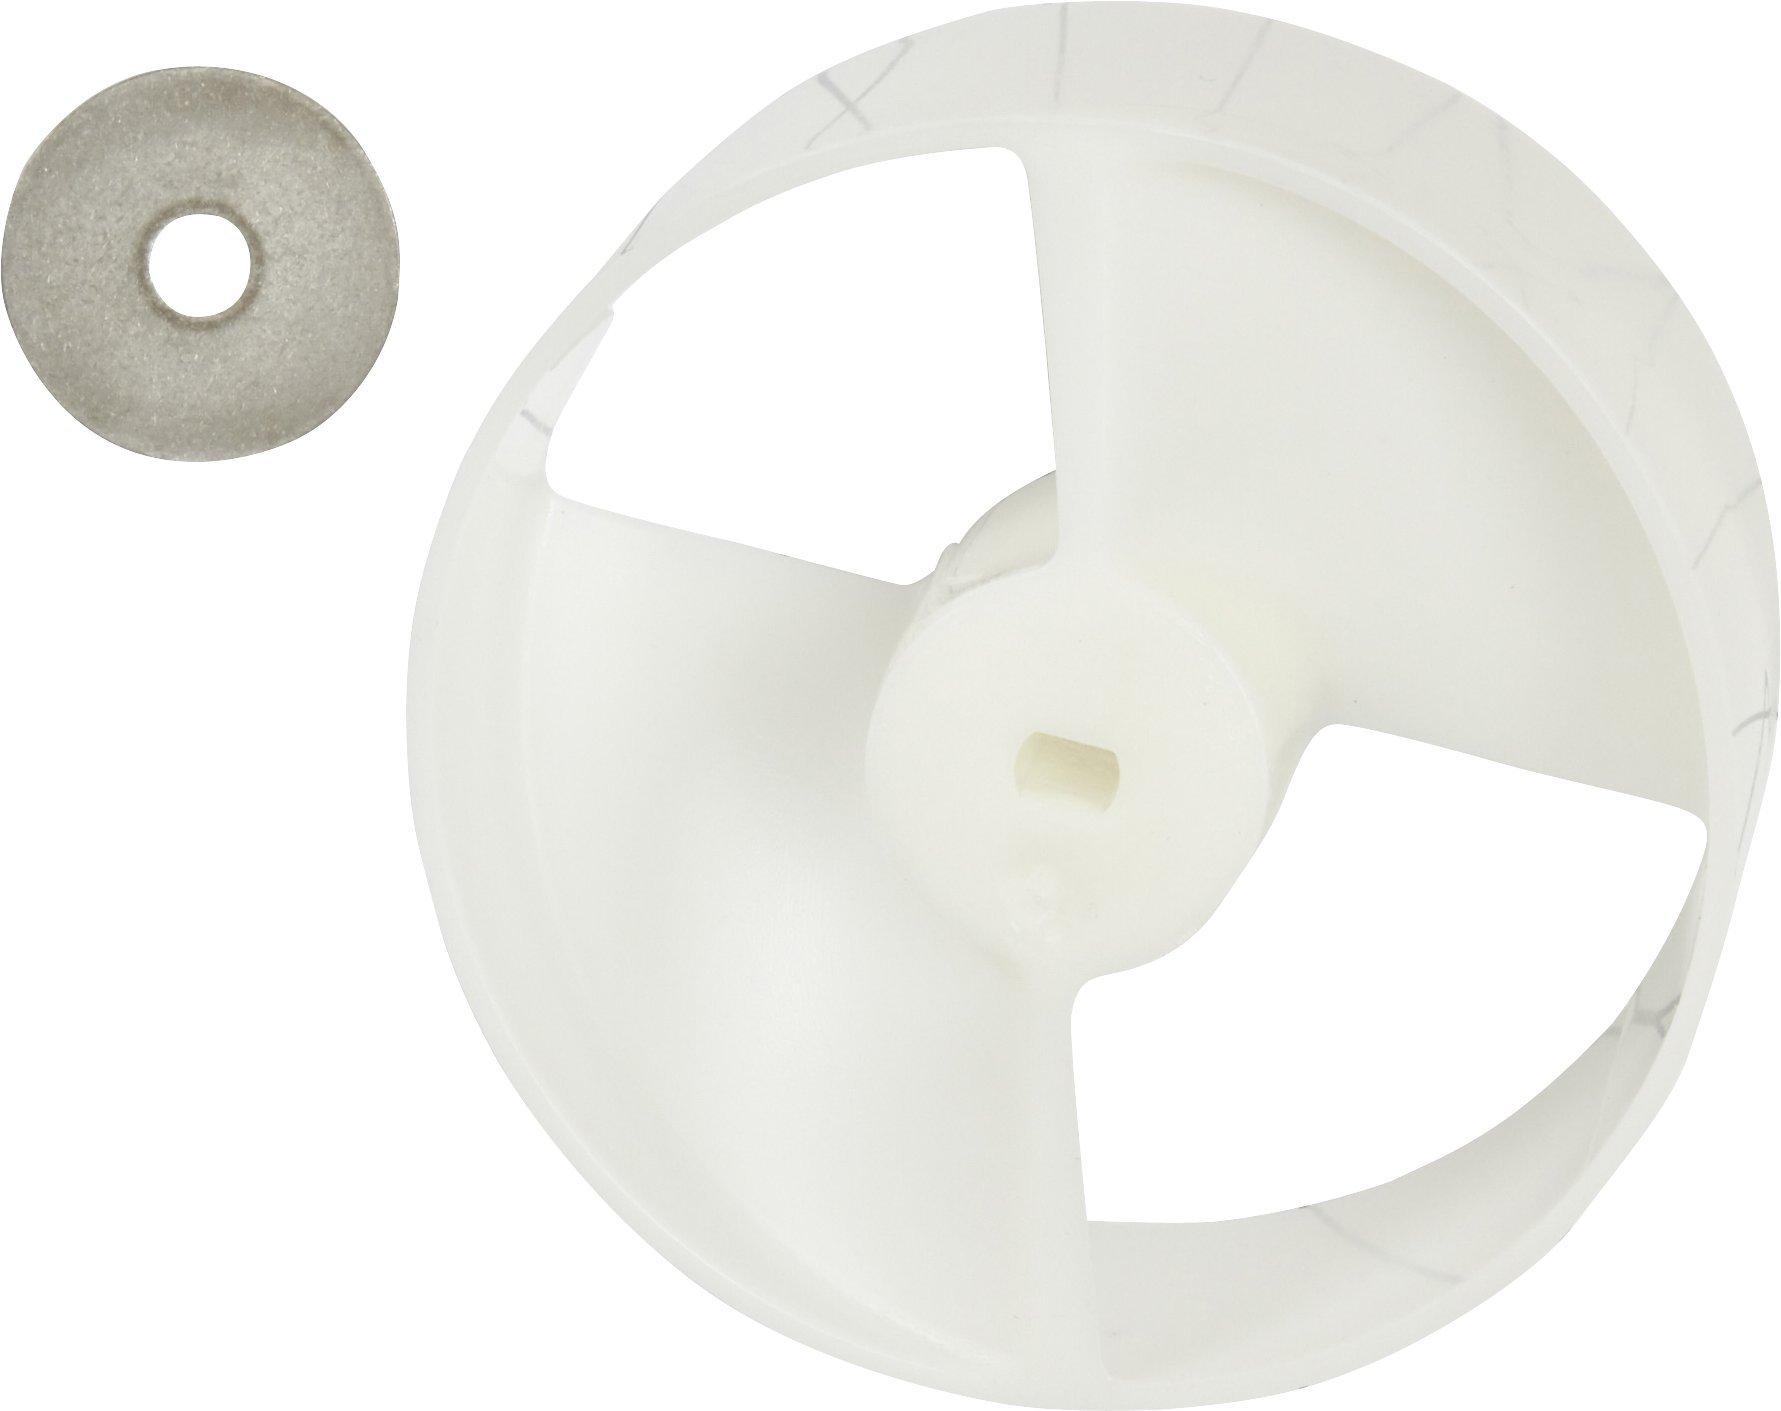 Whirlpool 4388736 Ice Bin Auger Drum